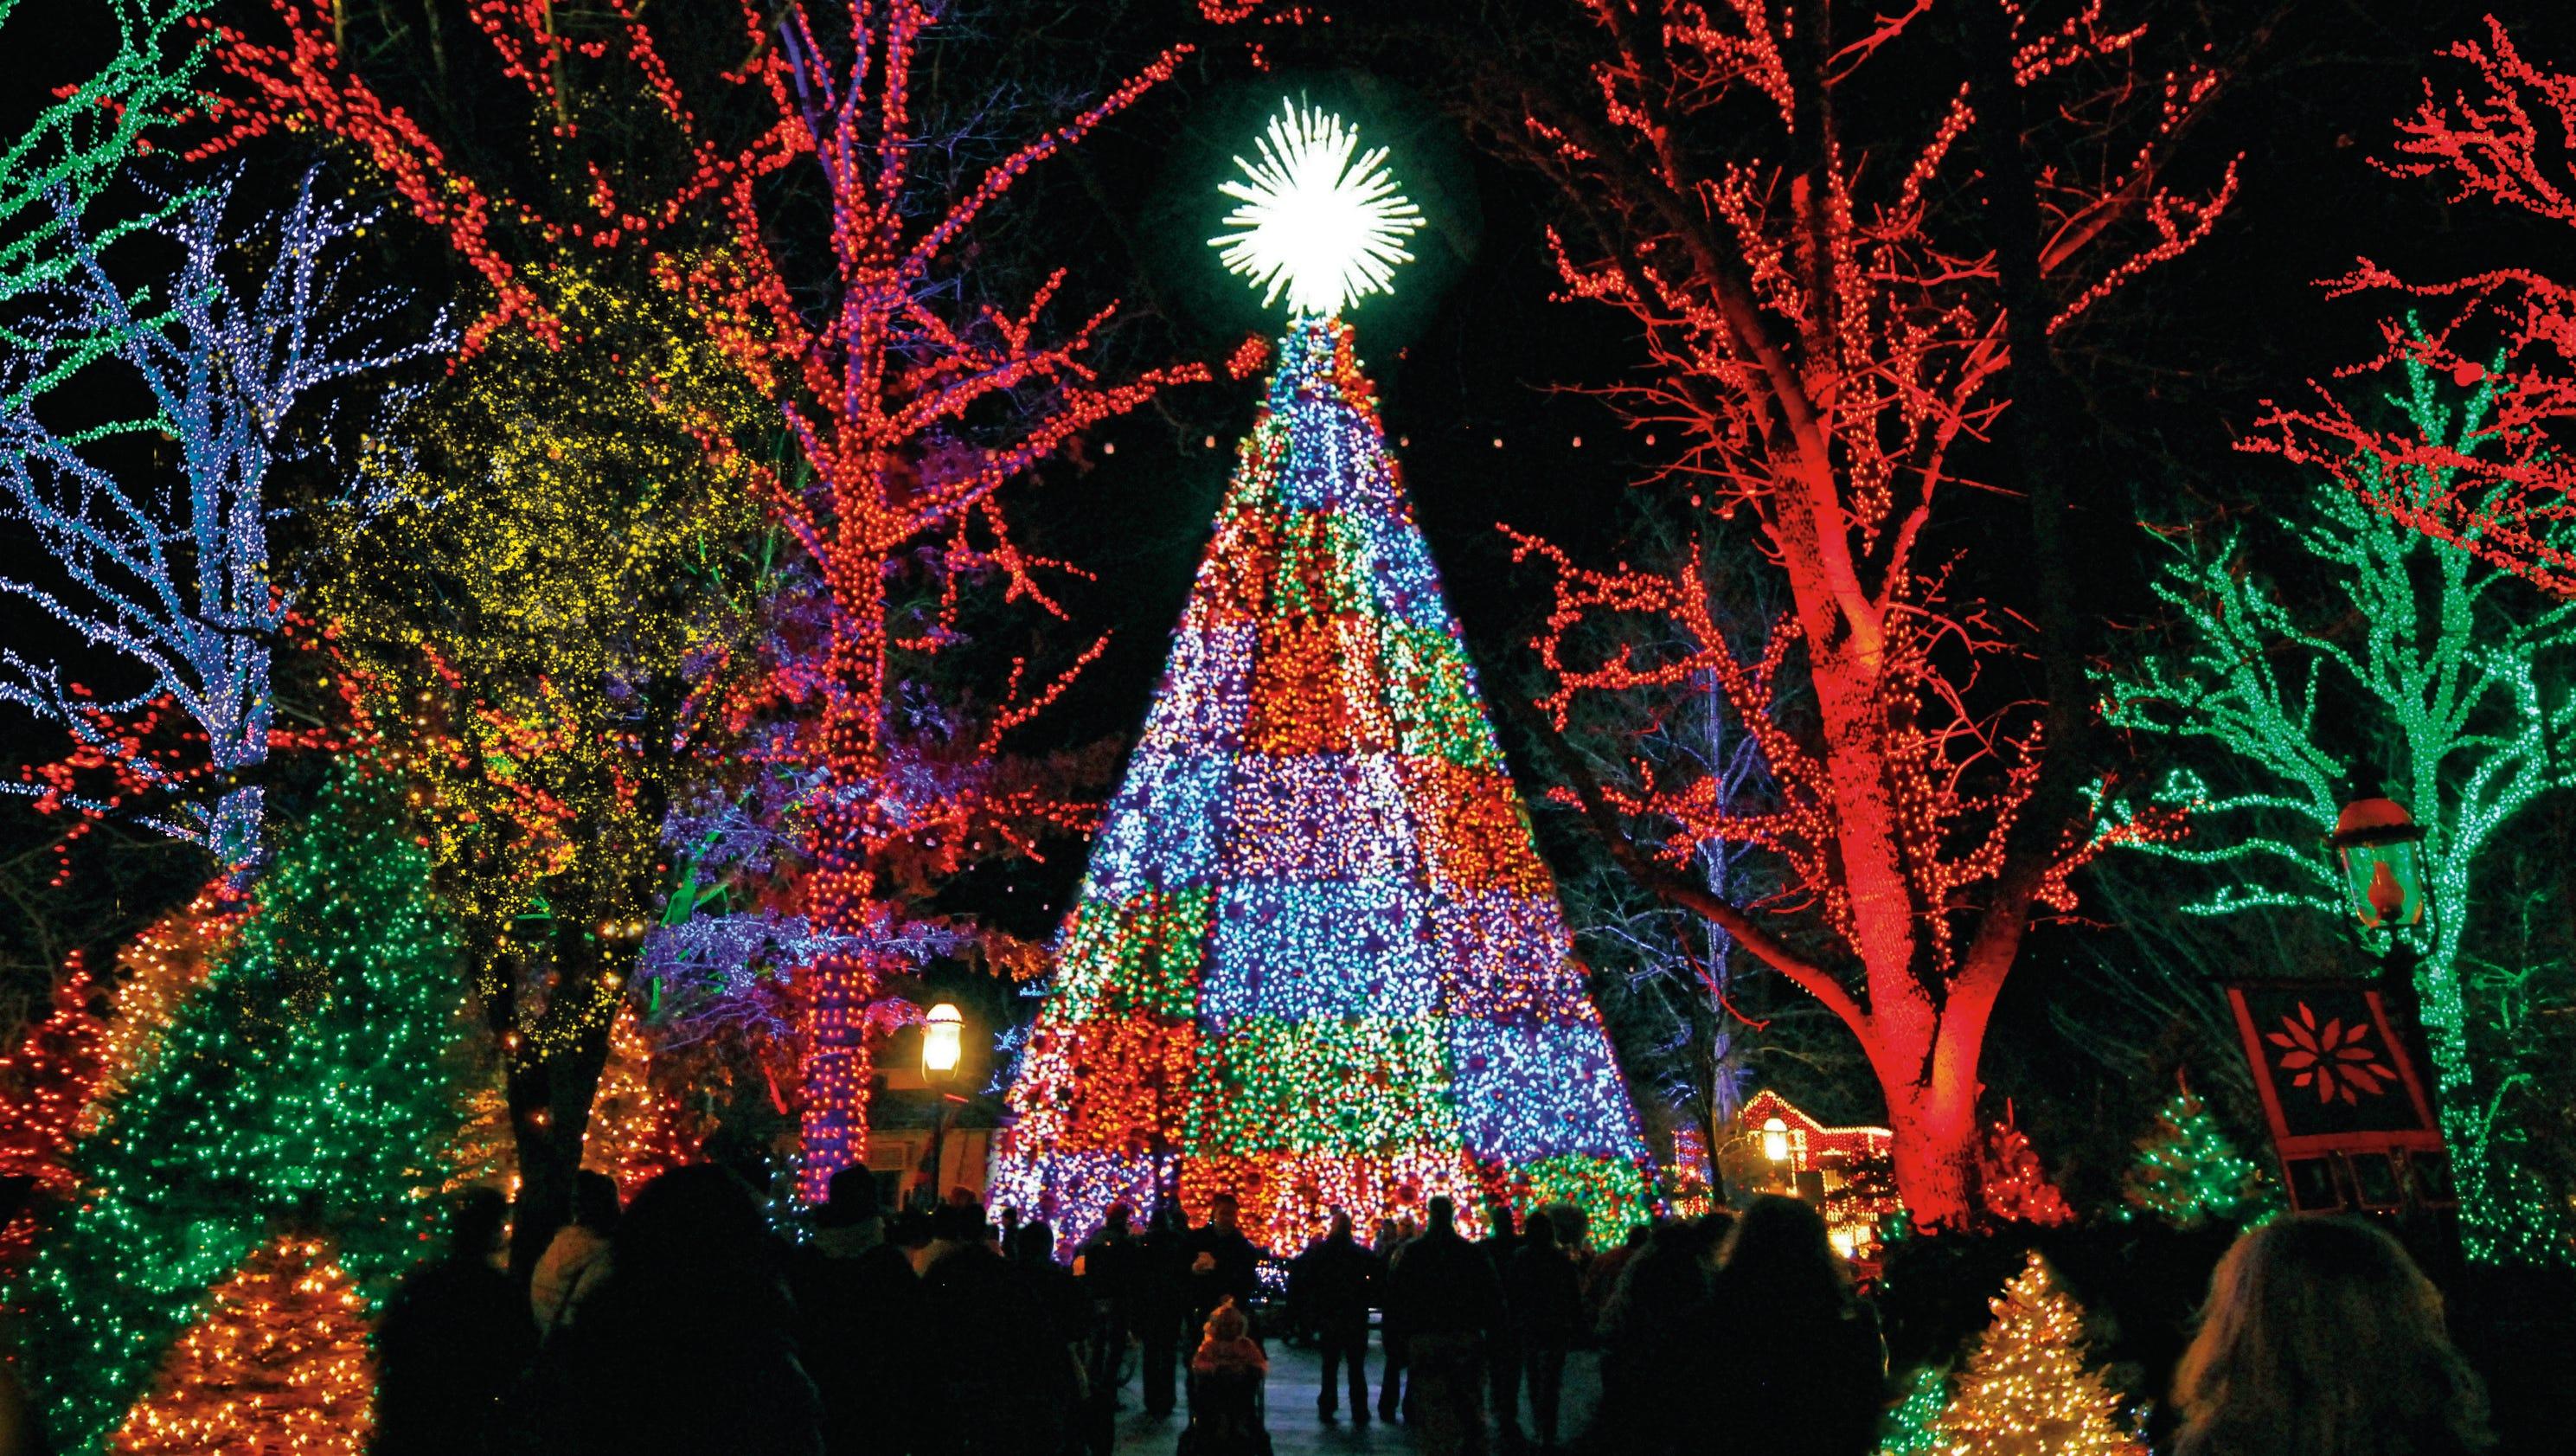 Kết quả hình ảnh cho Winter Wonderland in Tilles Park